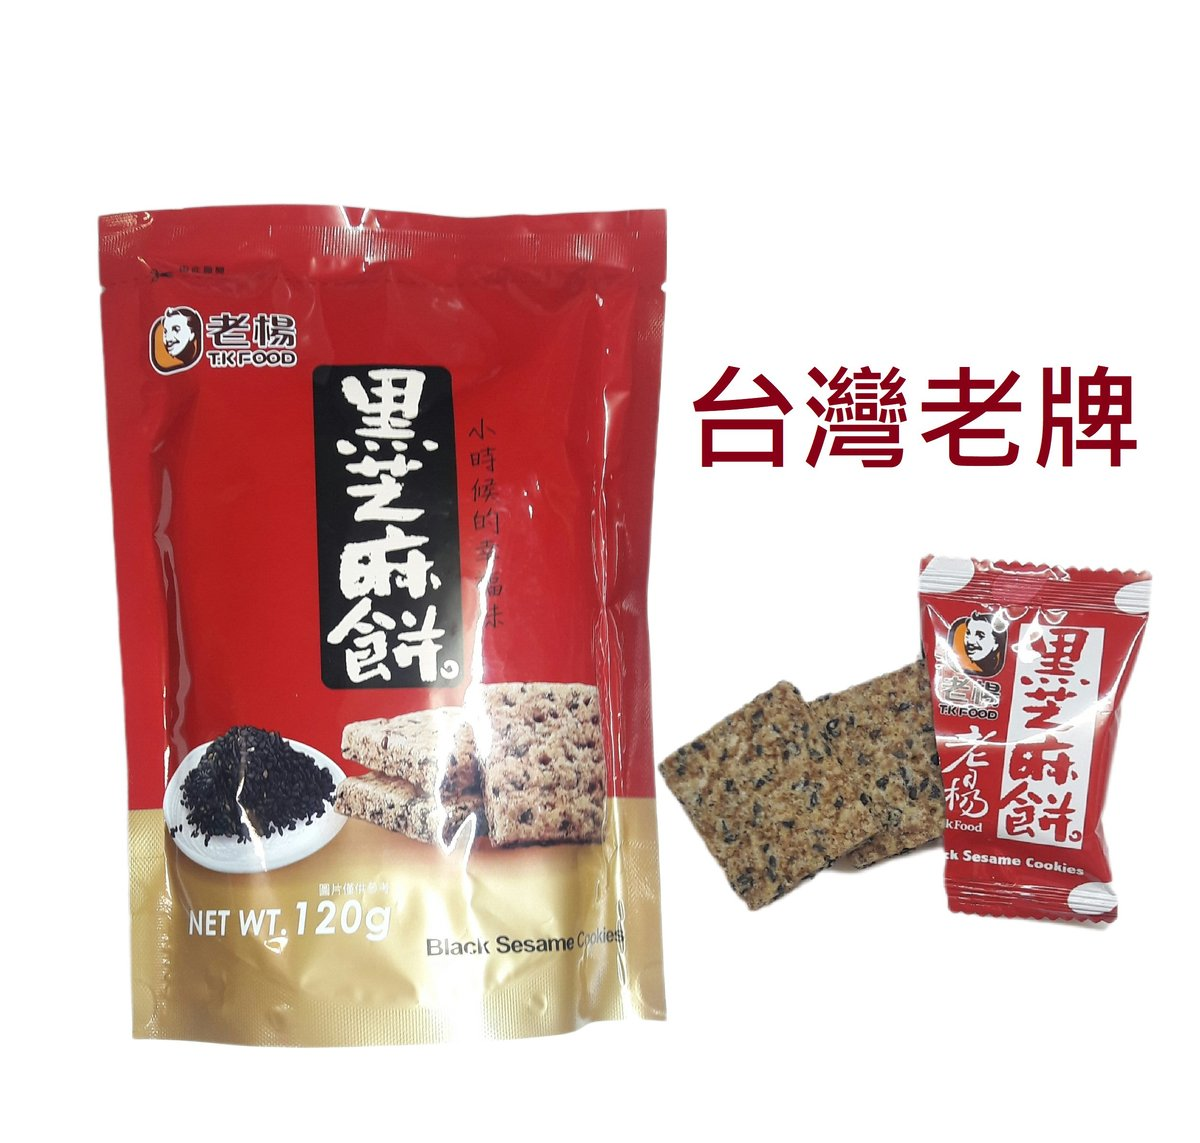 Taiwan Black Sesame Cookie (120g)